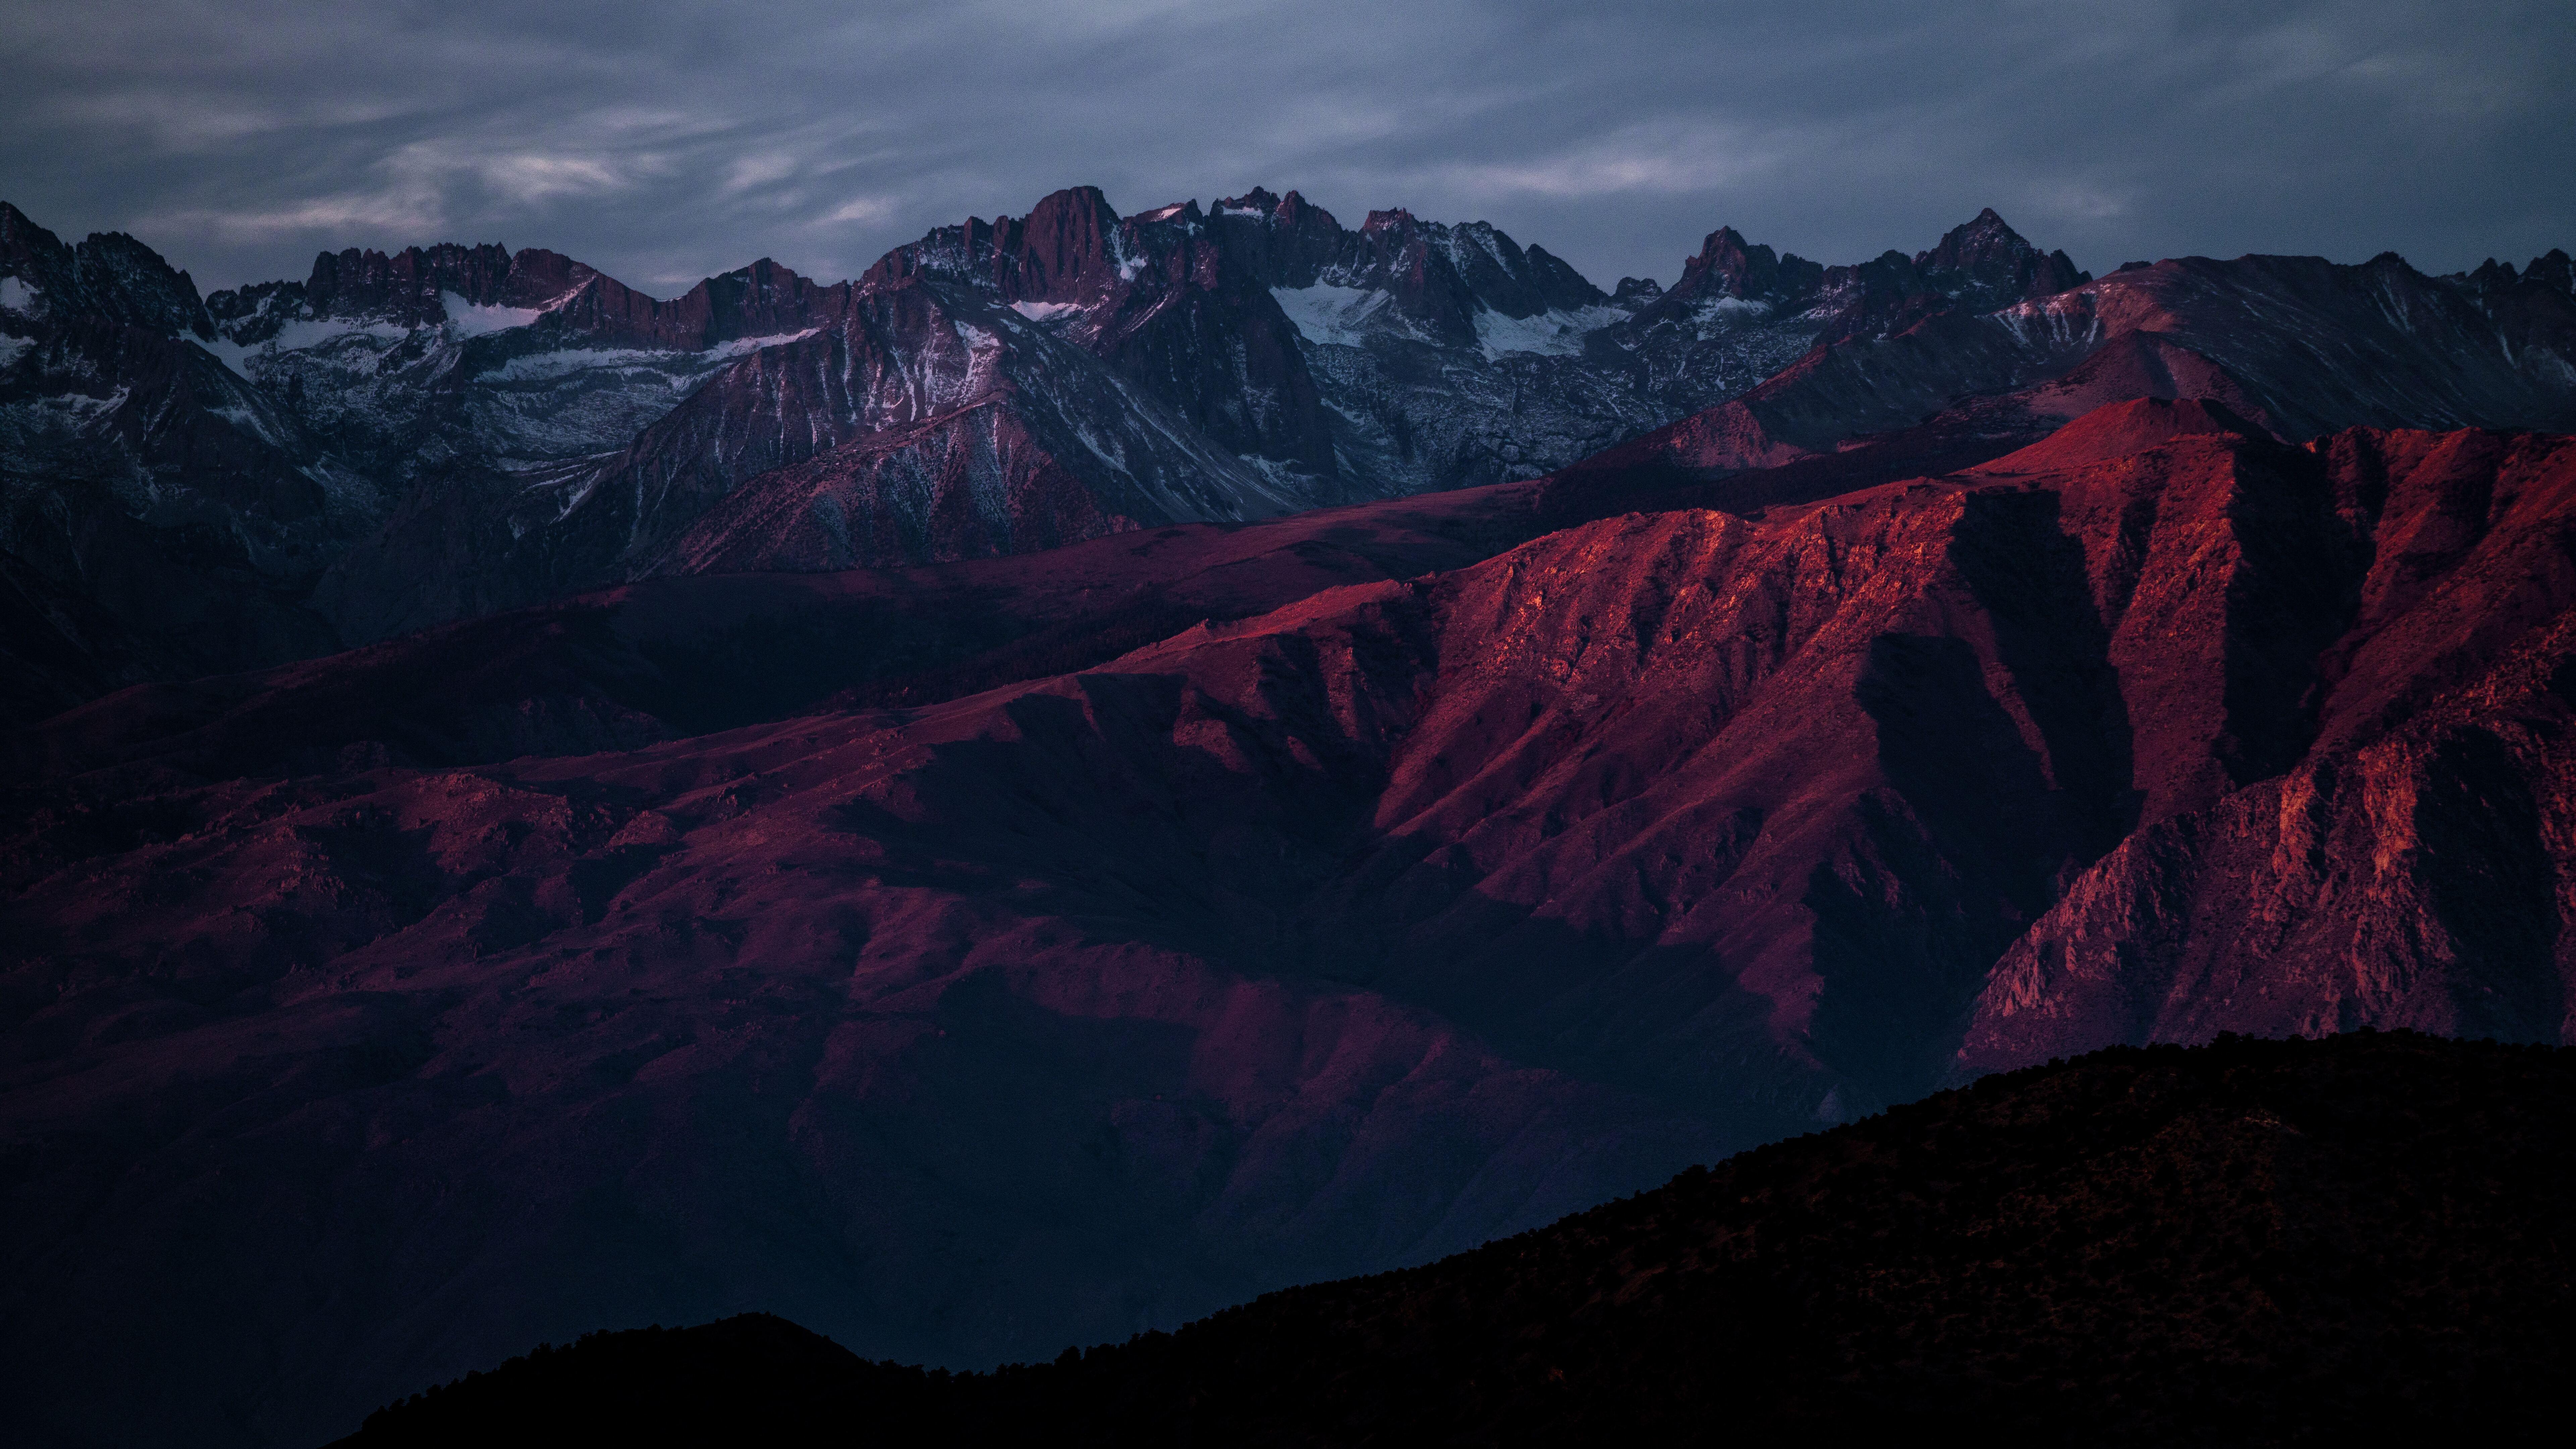 7680x4320 Red Mountain Range Highlands 8k 8k Hd 4k